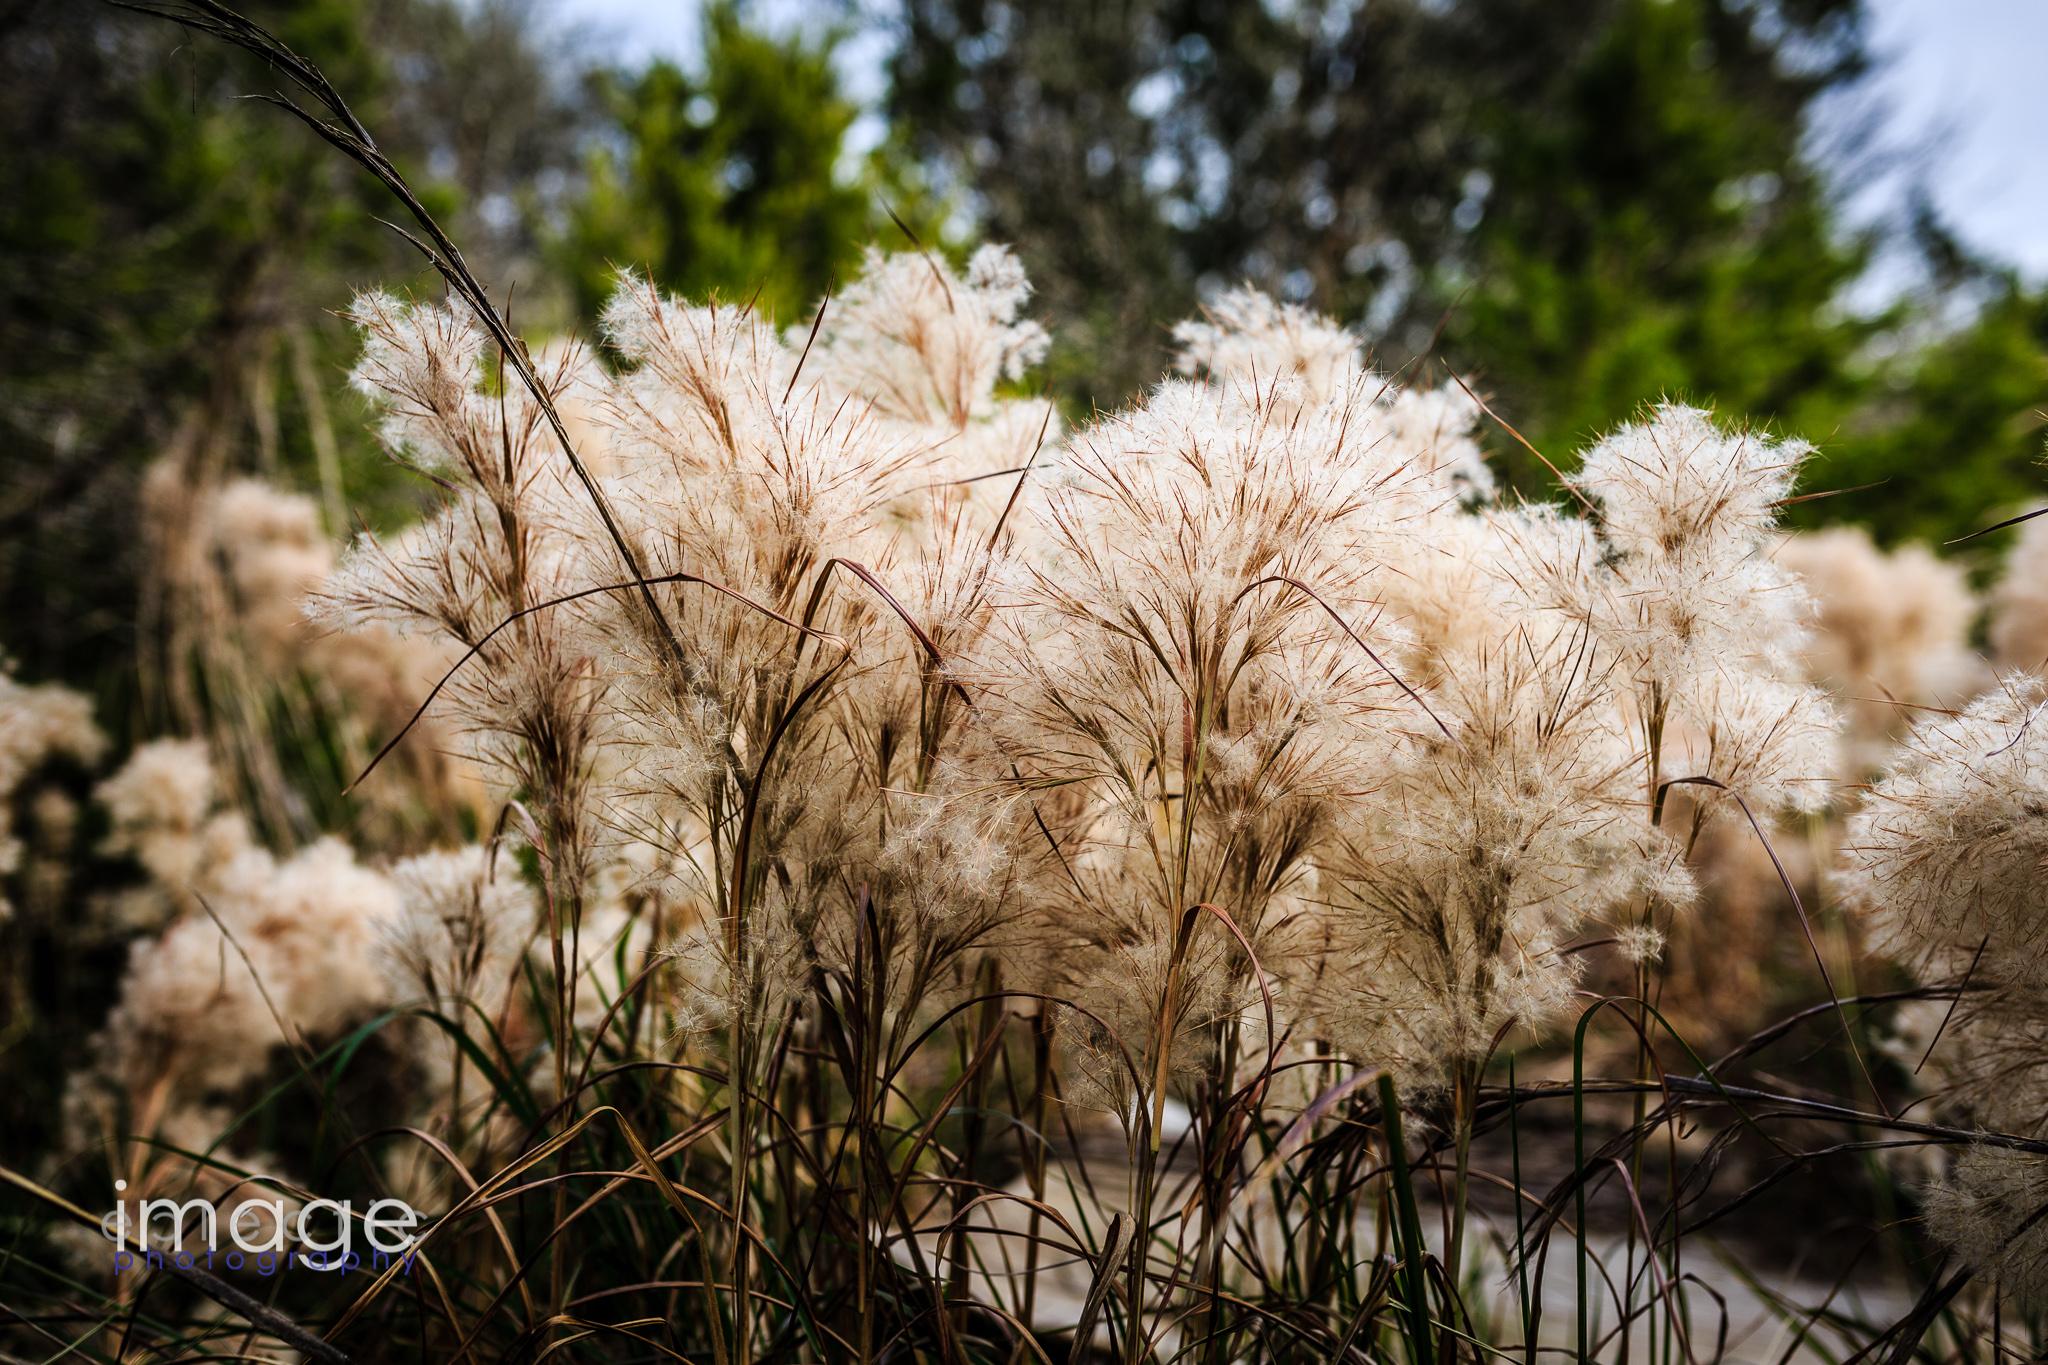 Puffy White Grass